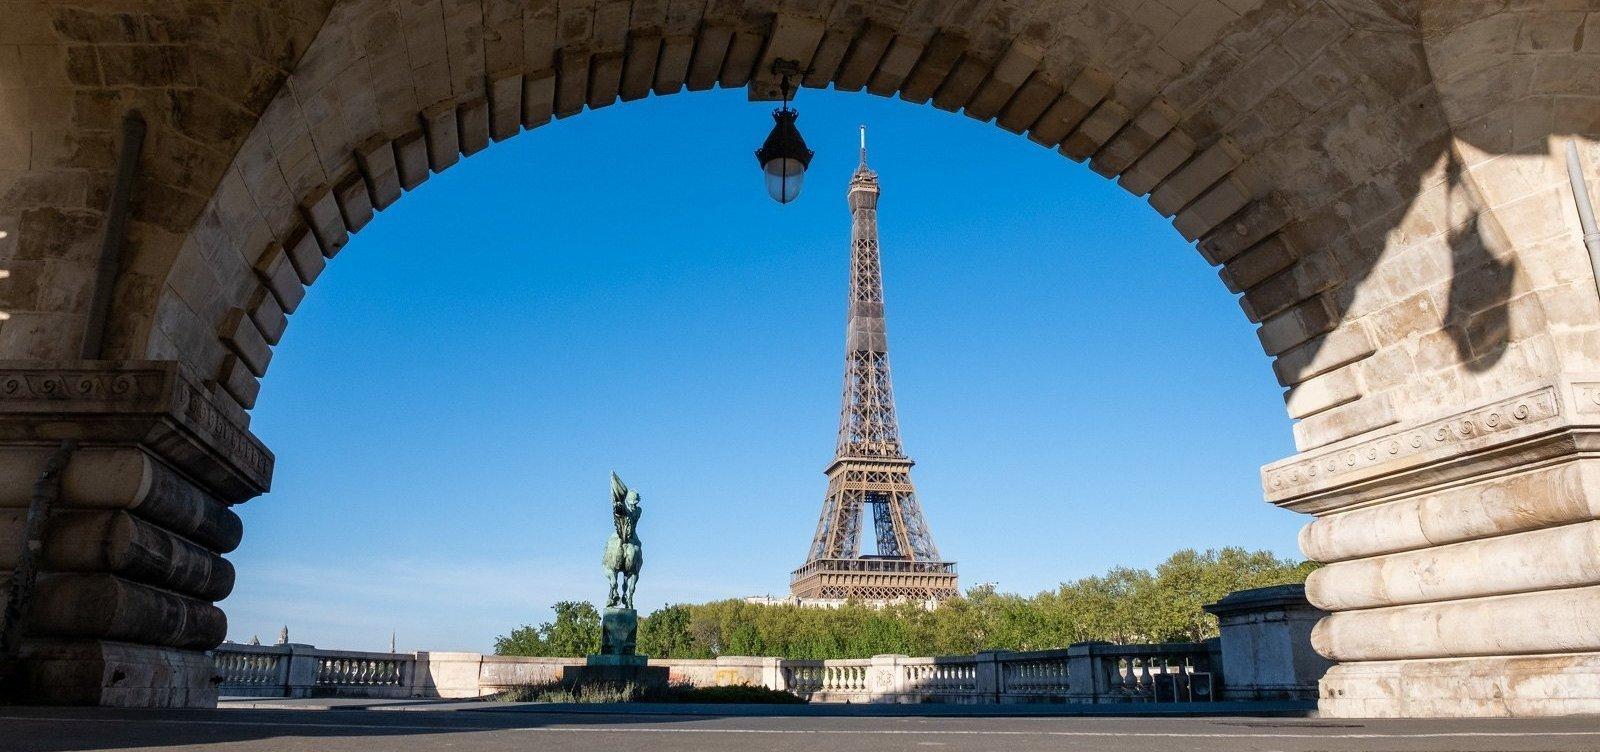 Lockdown na França será flexibilizado em três fases, diz governo